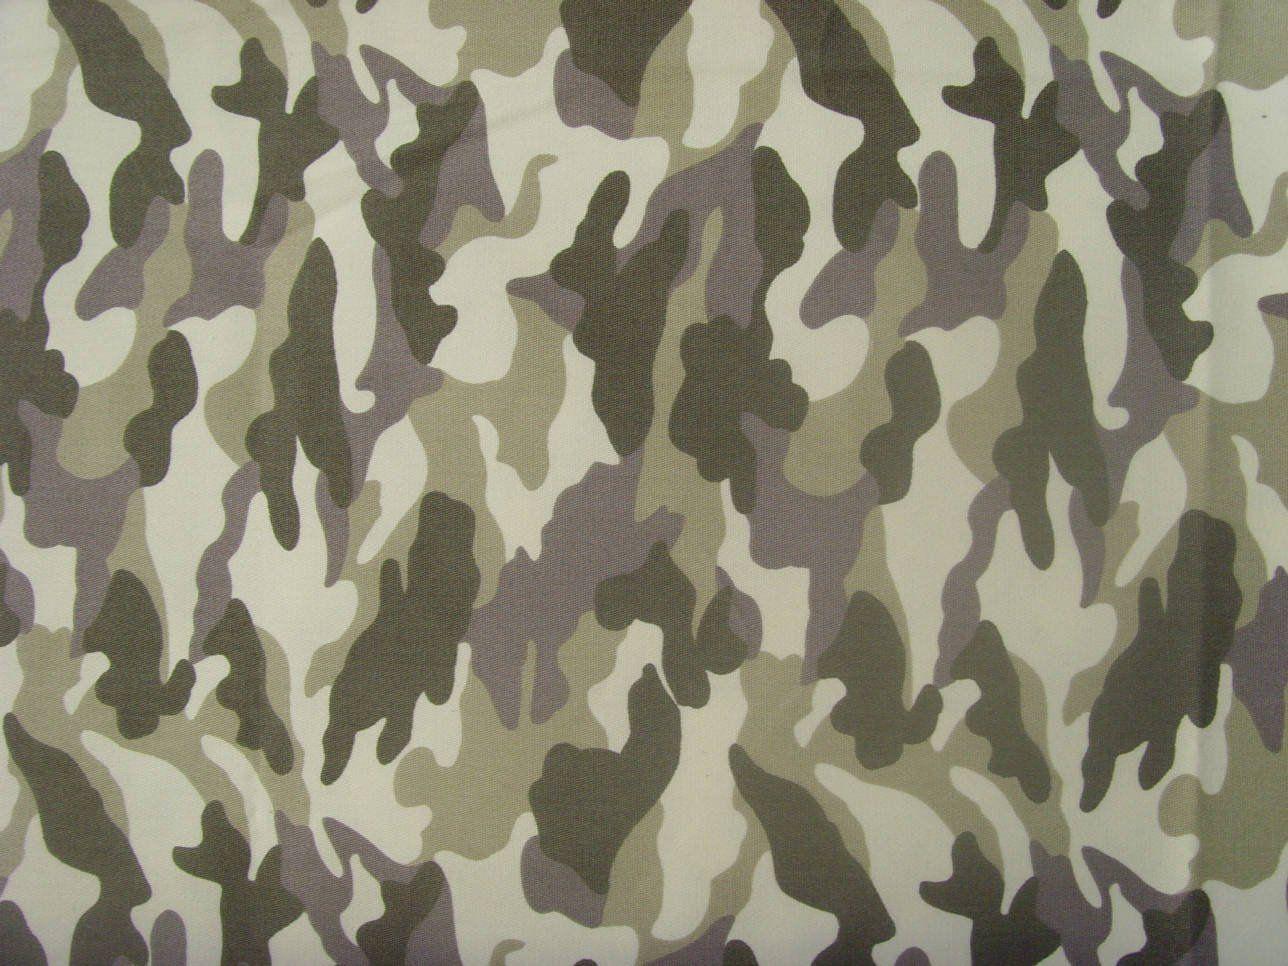 Military Camo Wallpaper 87 | ARMY CAMO SURPLUS REPARATION ...